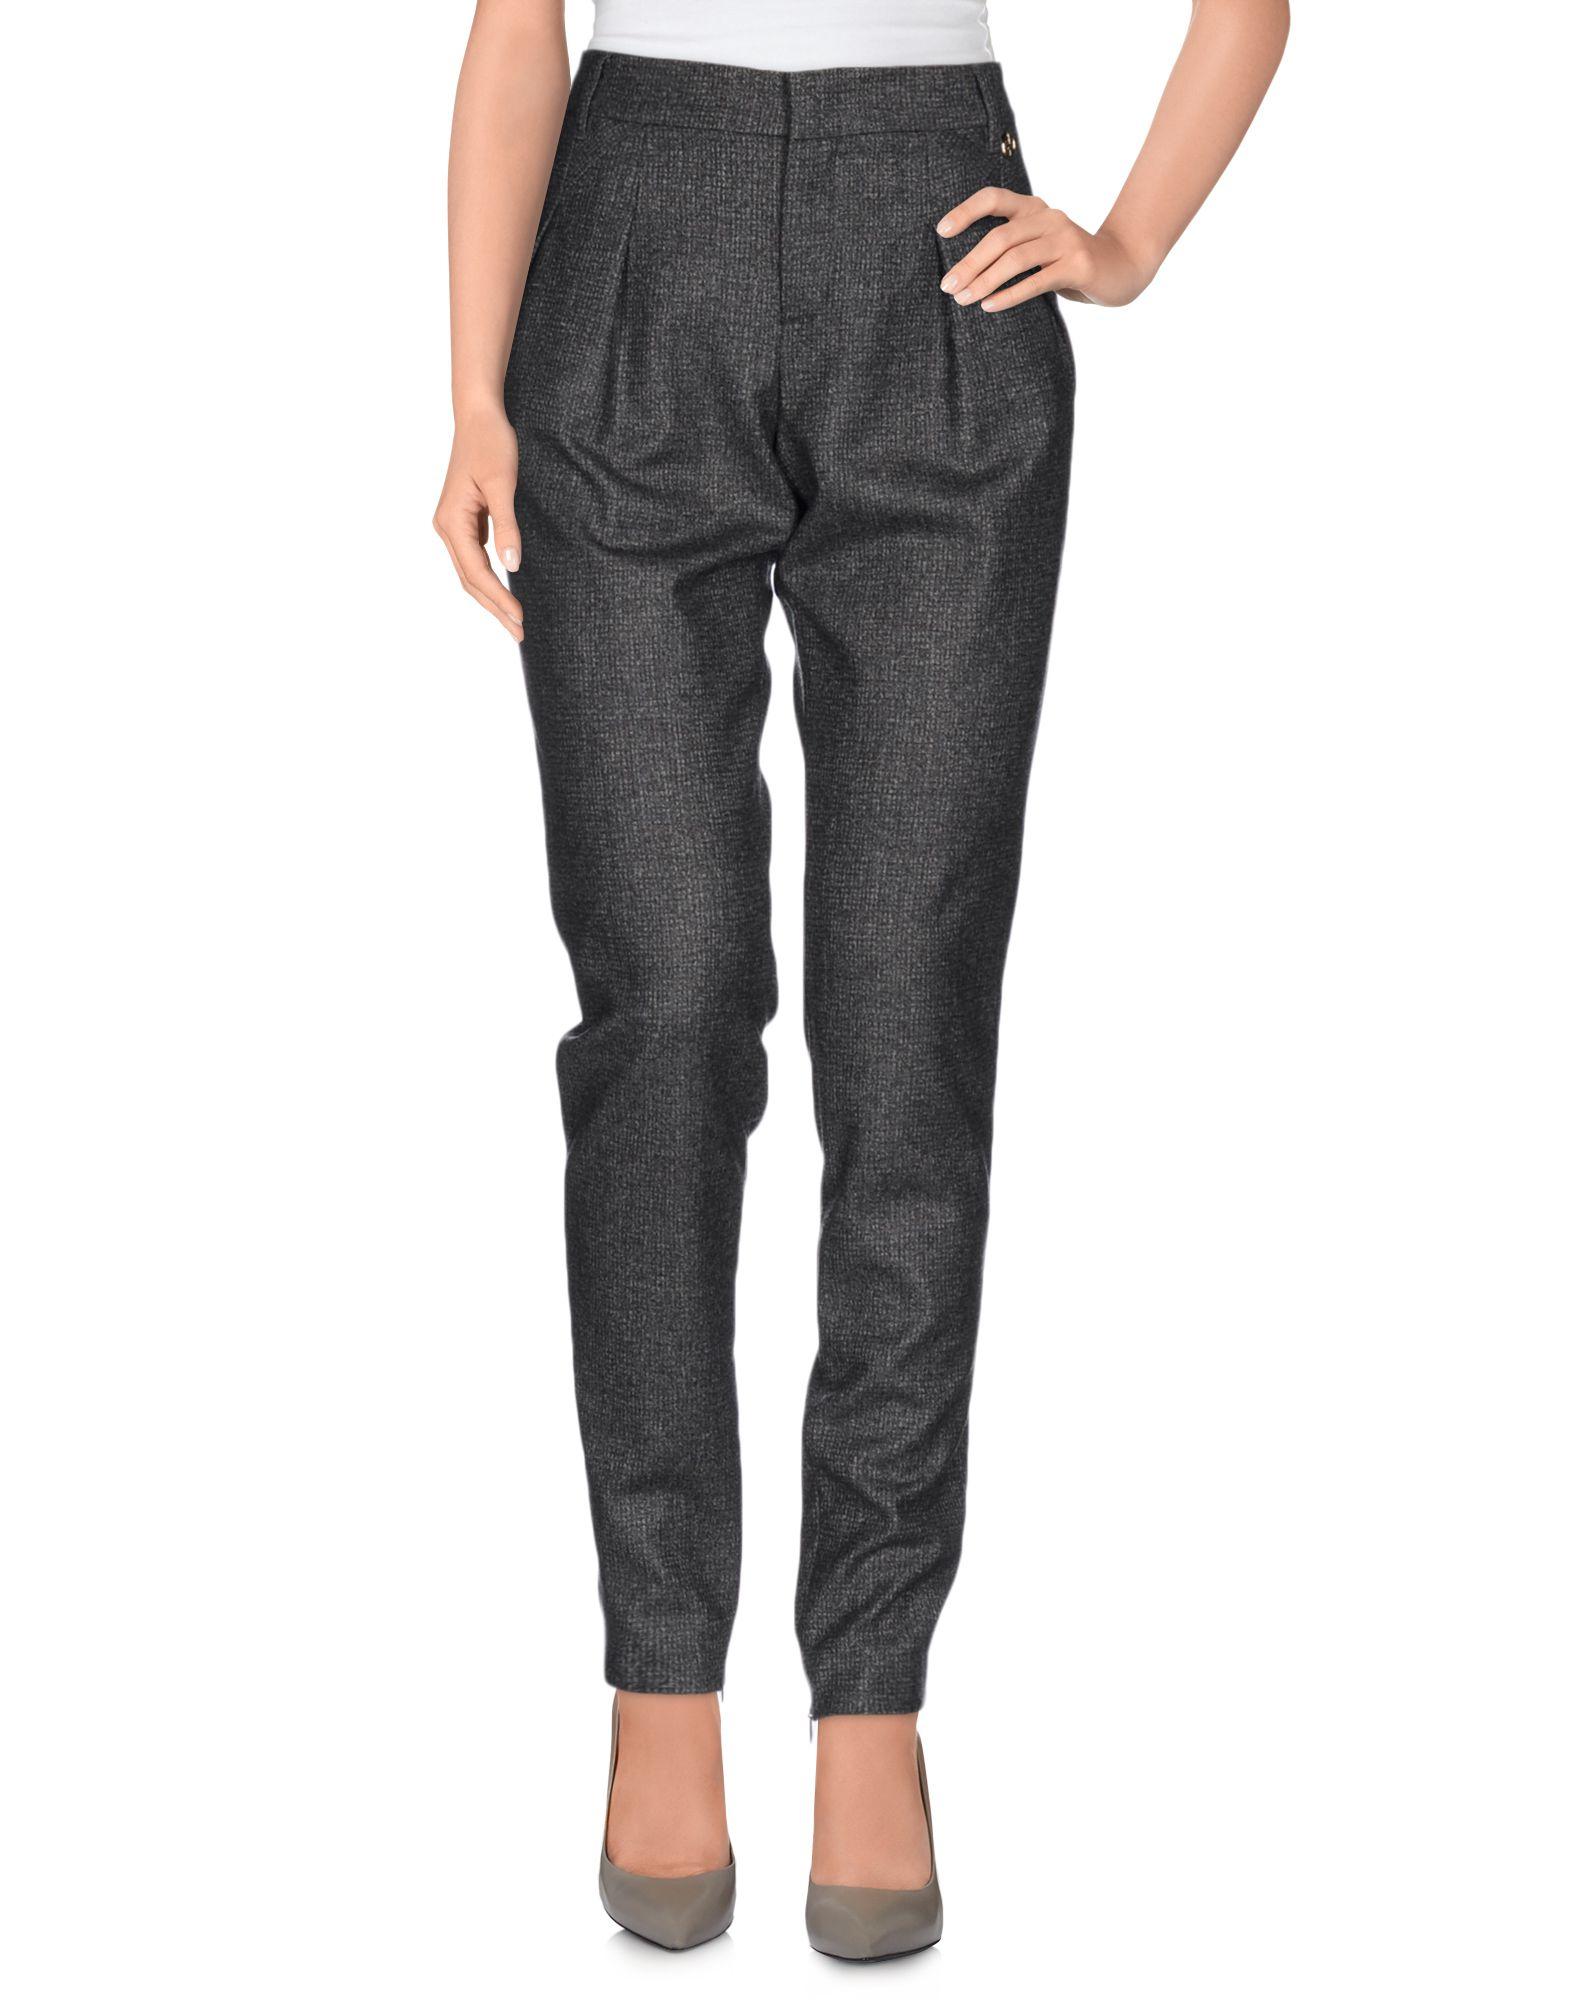 New Gucci Women39s Black Casual Trouser